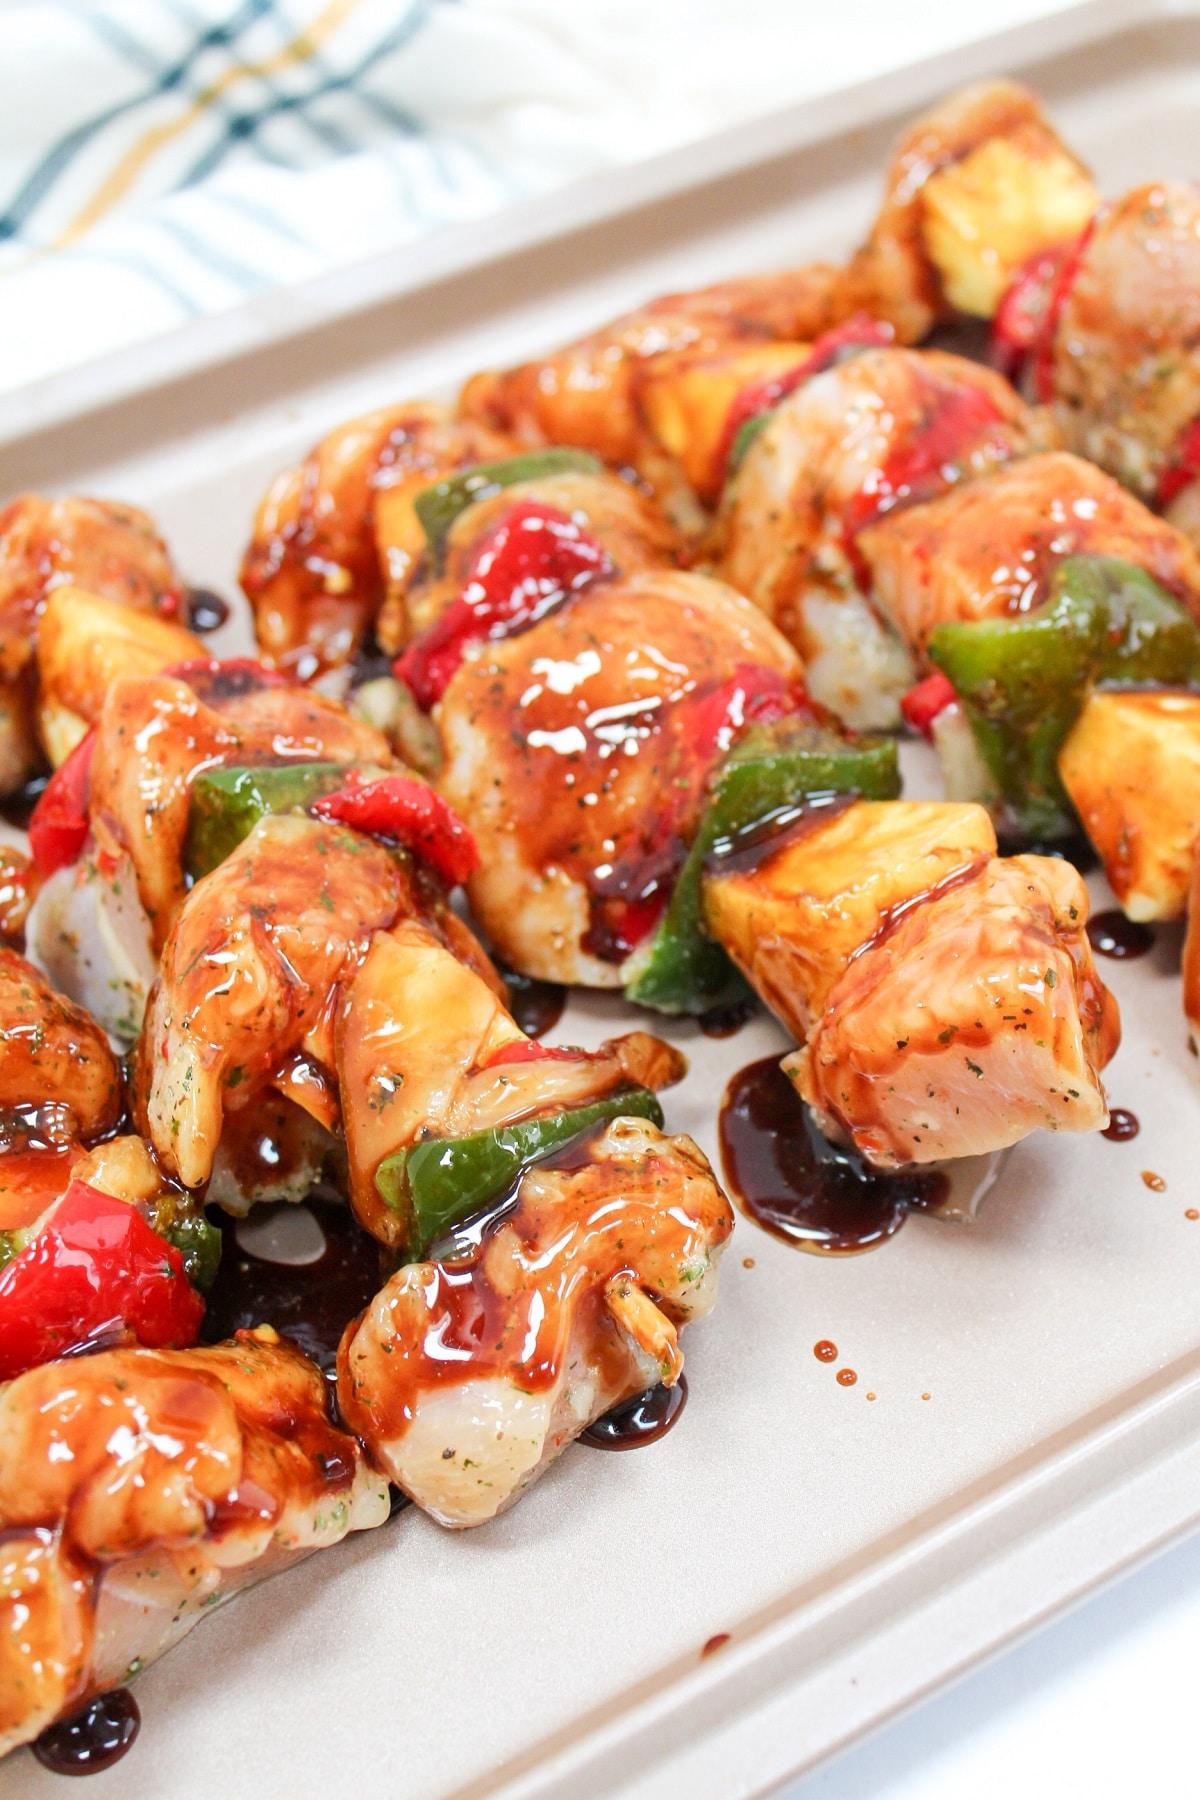 uncooked teriyaki chicken kabobs